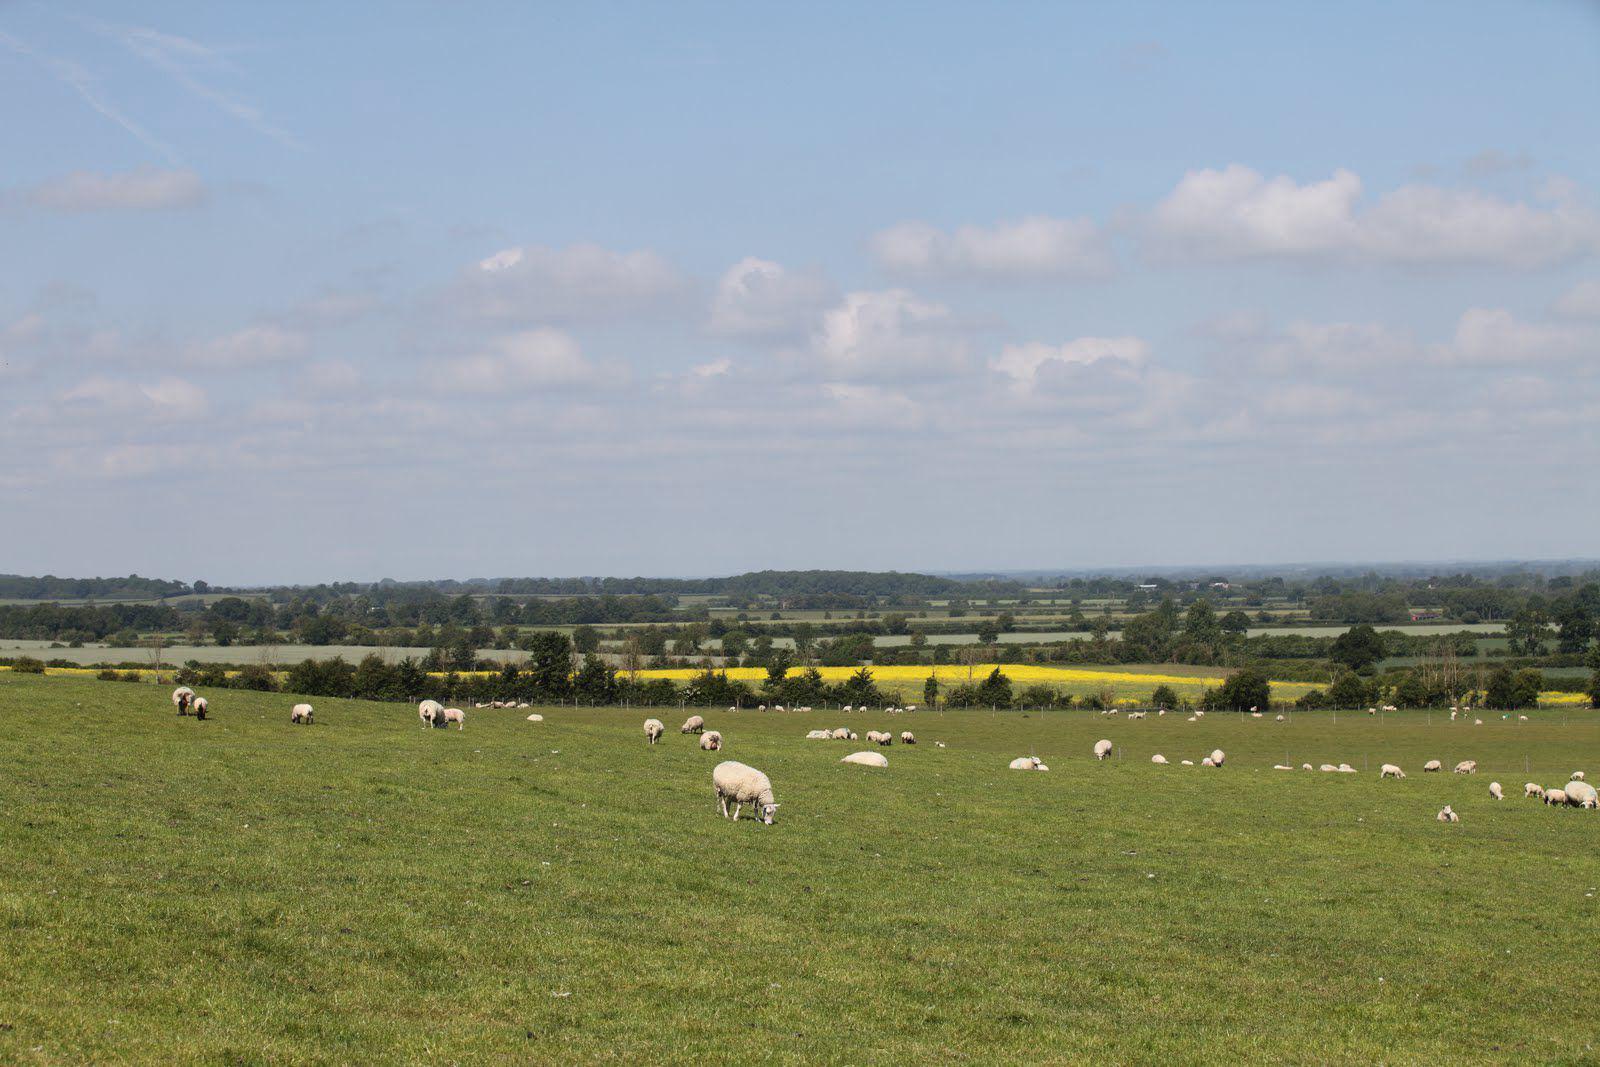 Swindon Camping | Campsites Near Swindon, Wiltshire